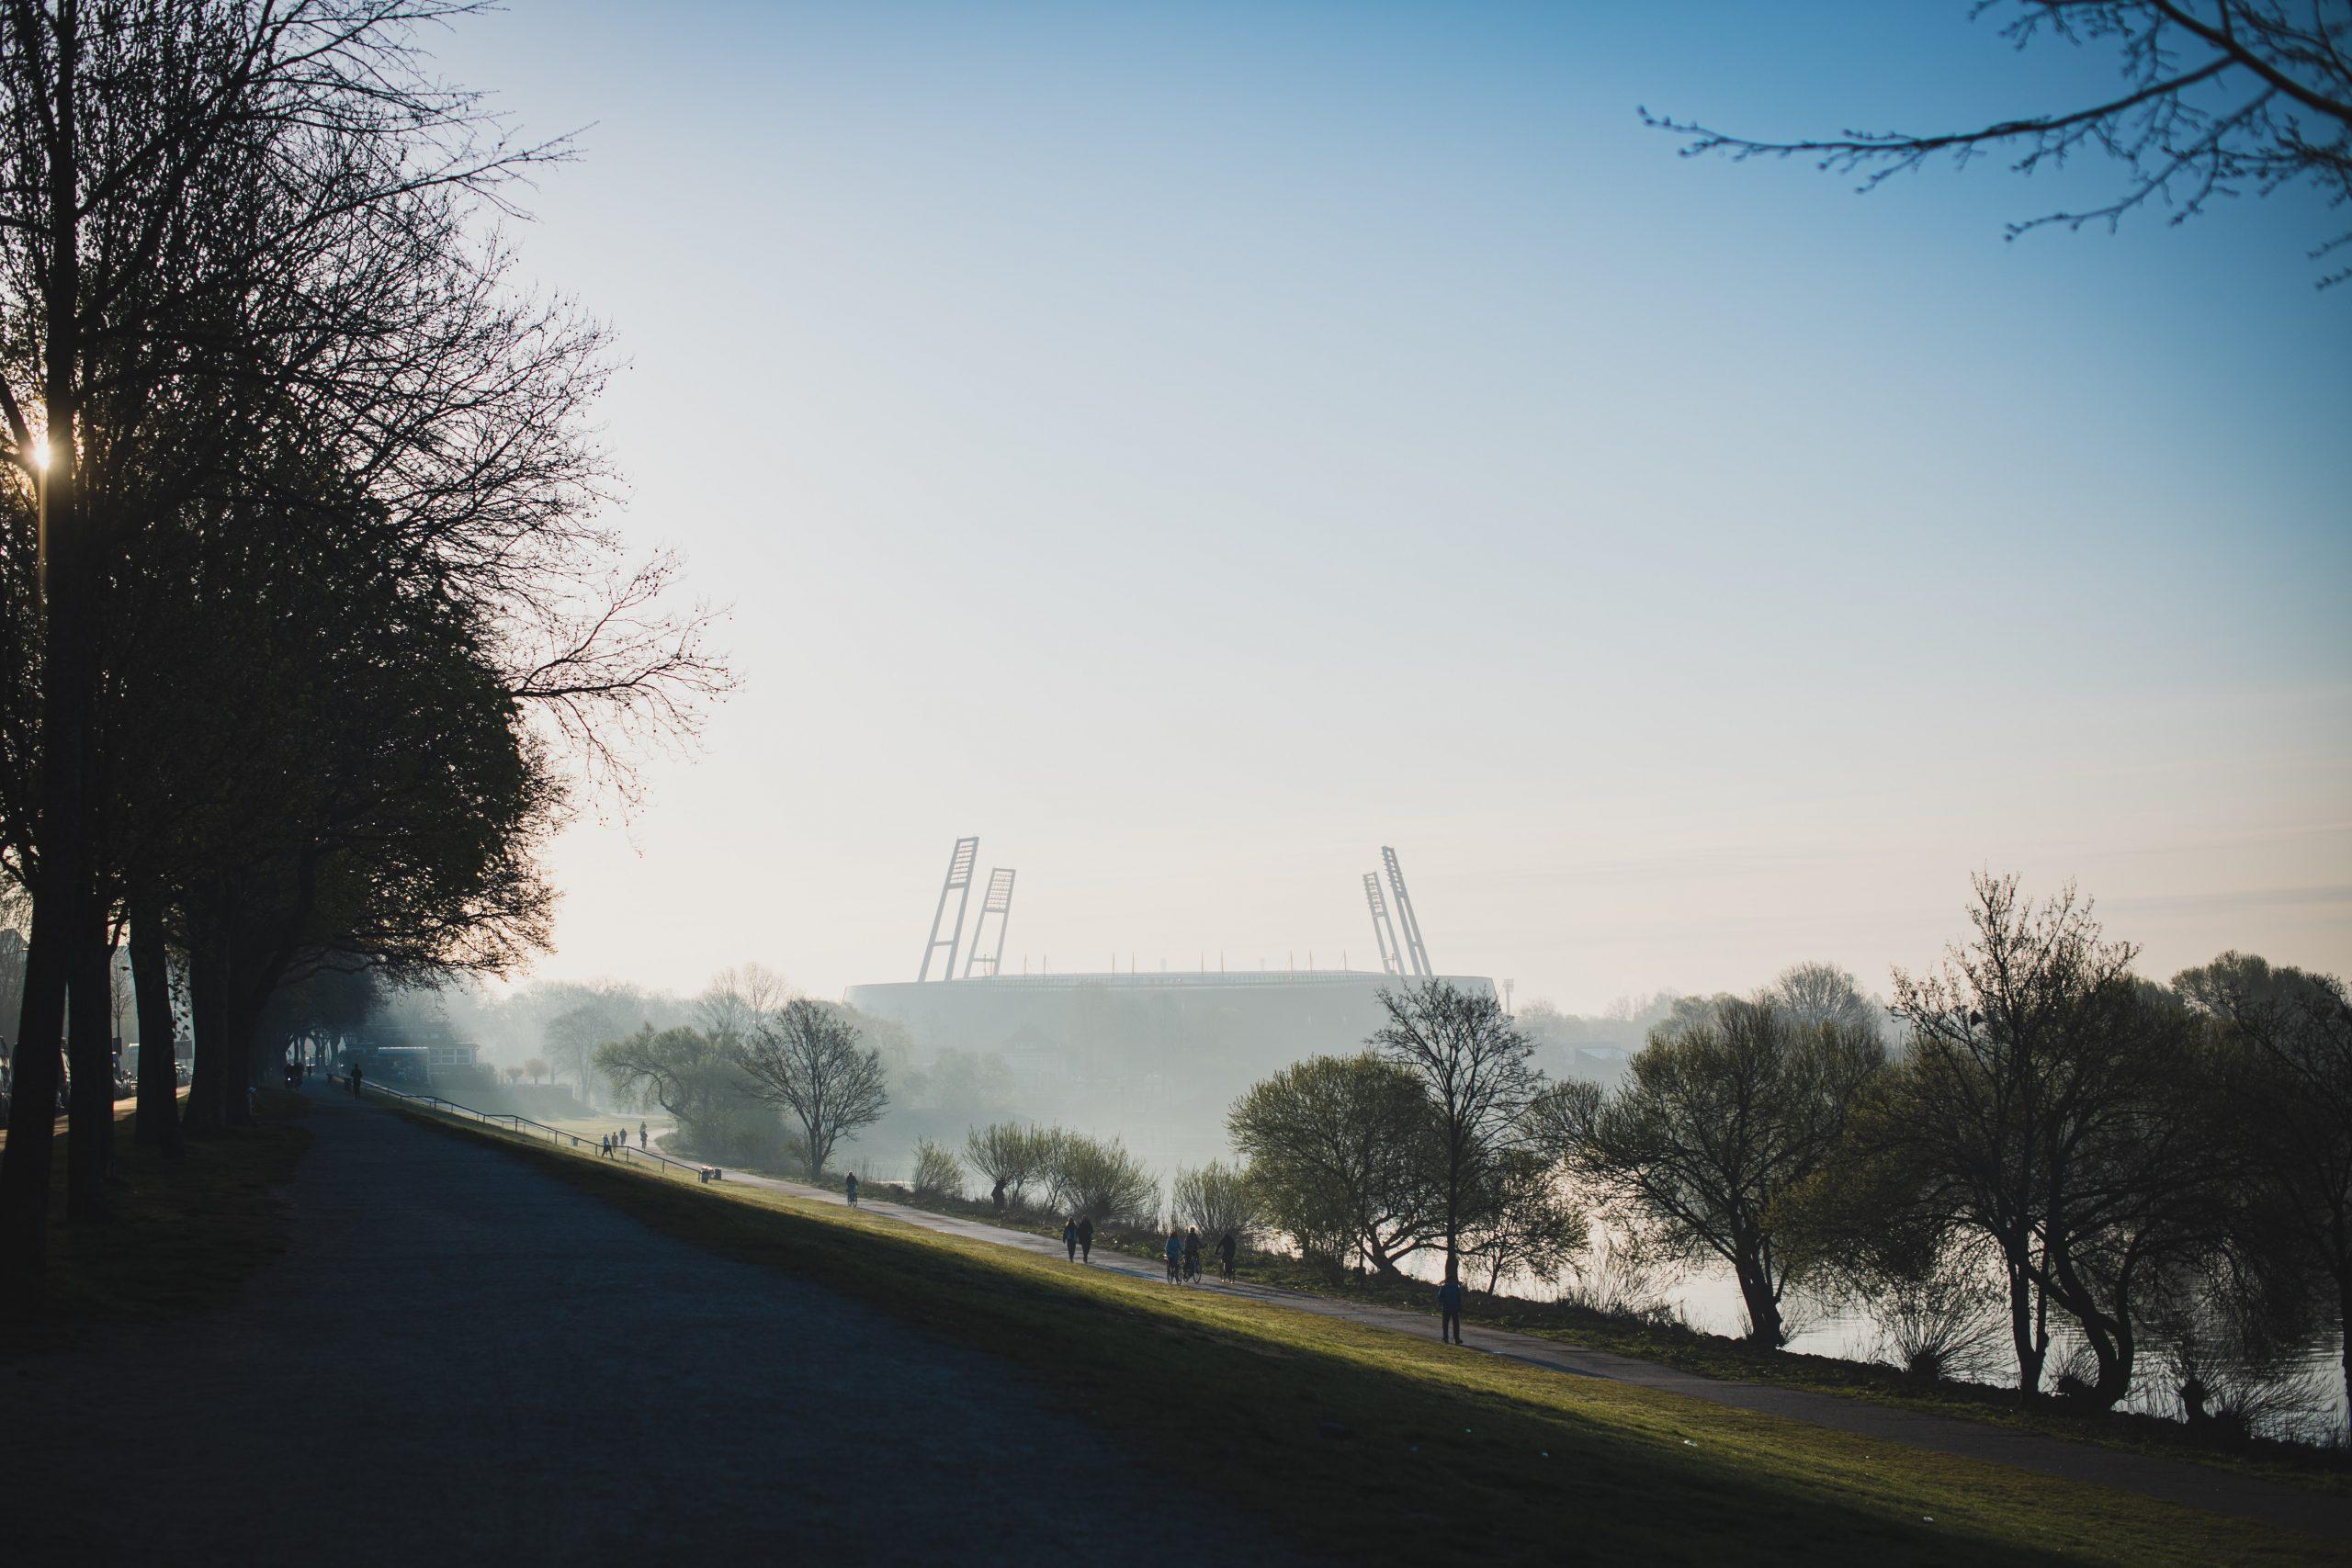 Wandertouren in Deutschland, Wandern in Bremen, Wandern an der Weser